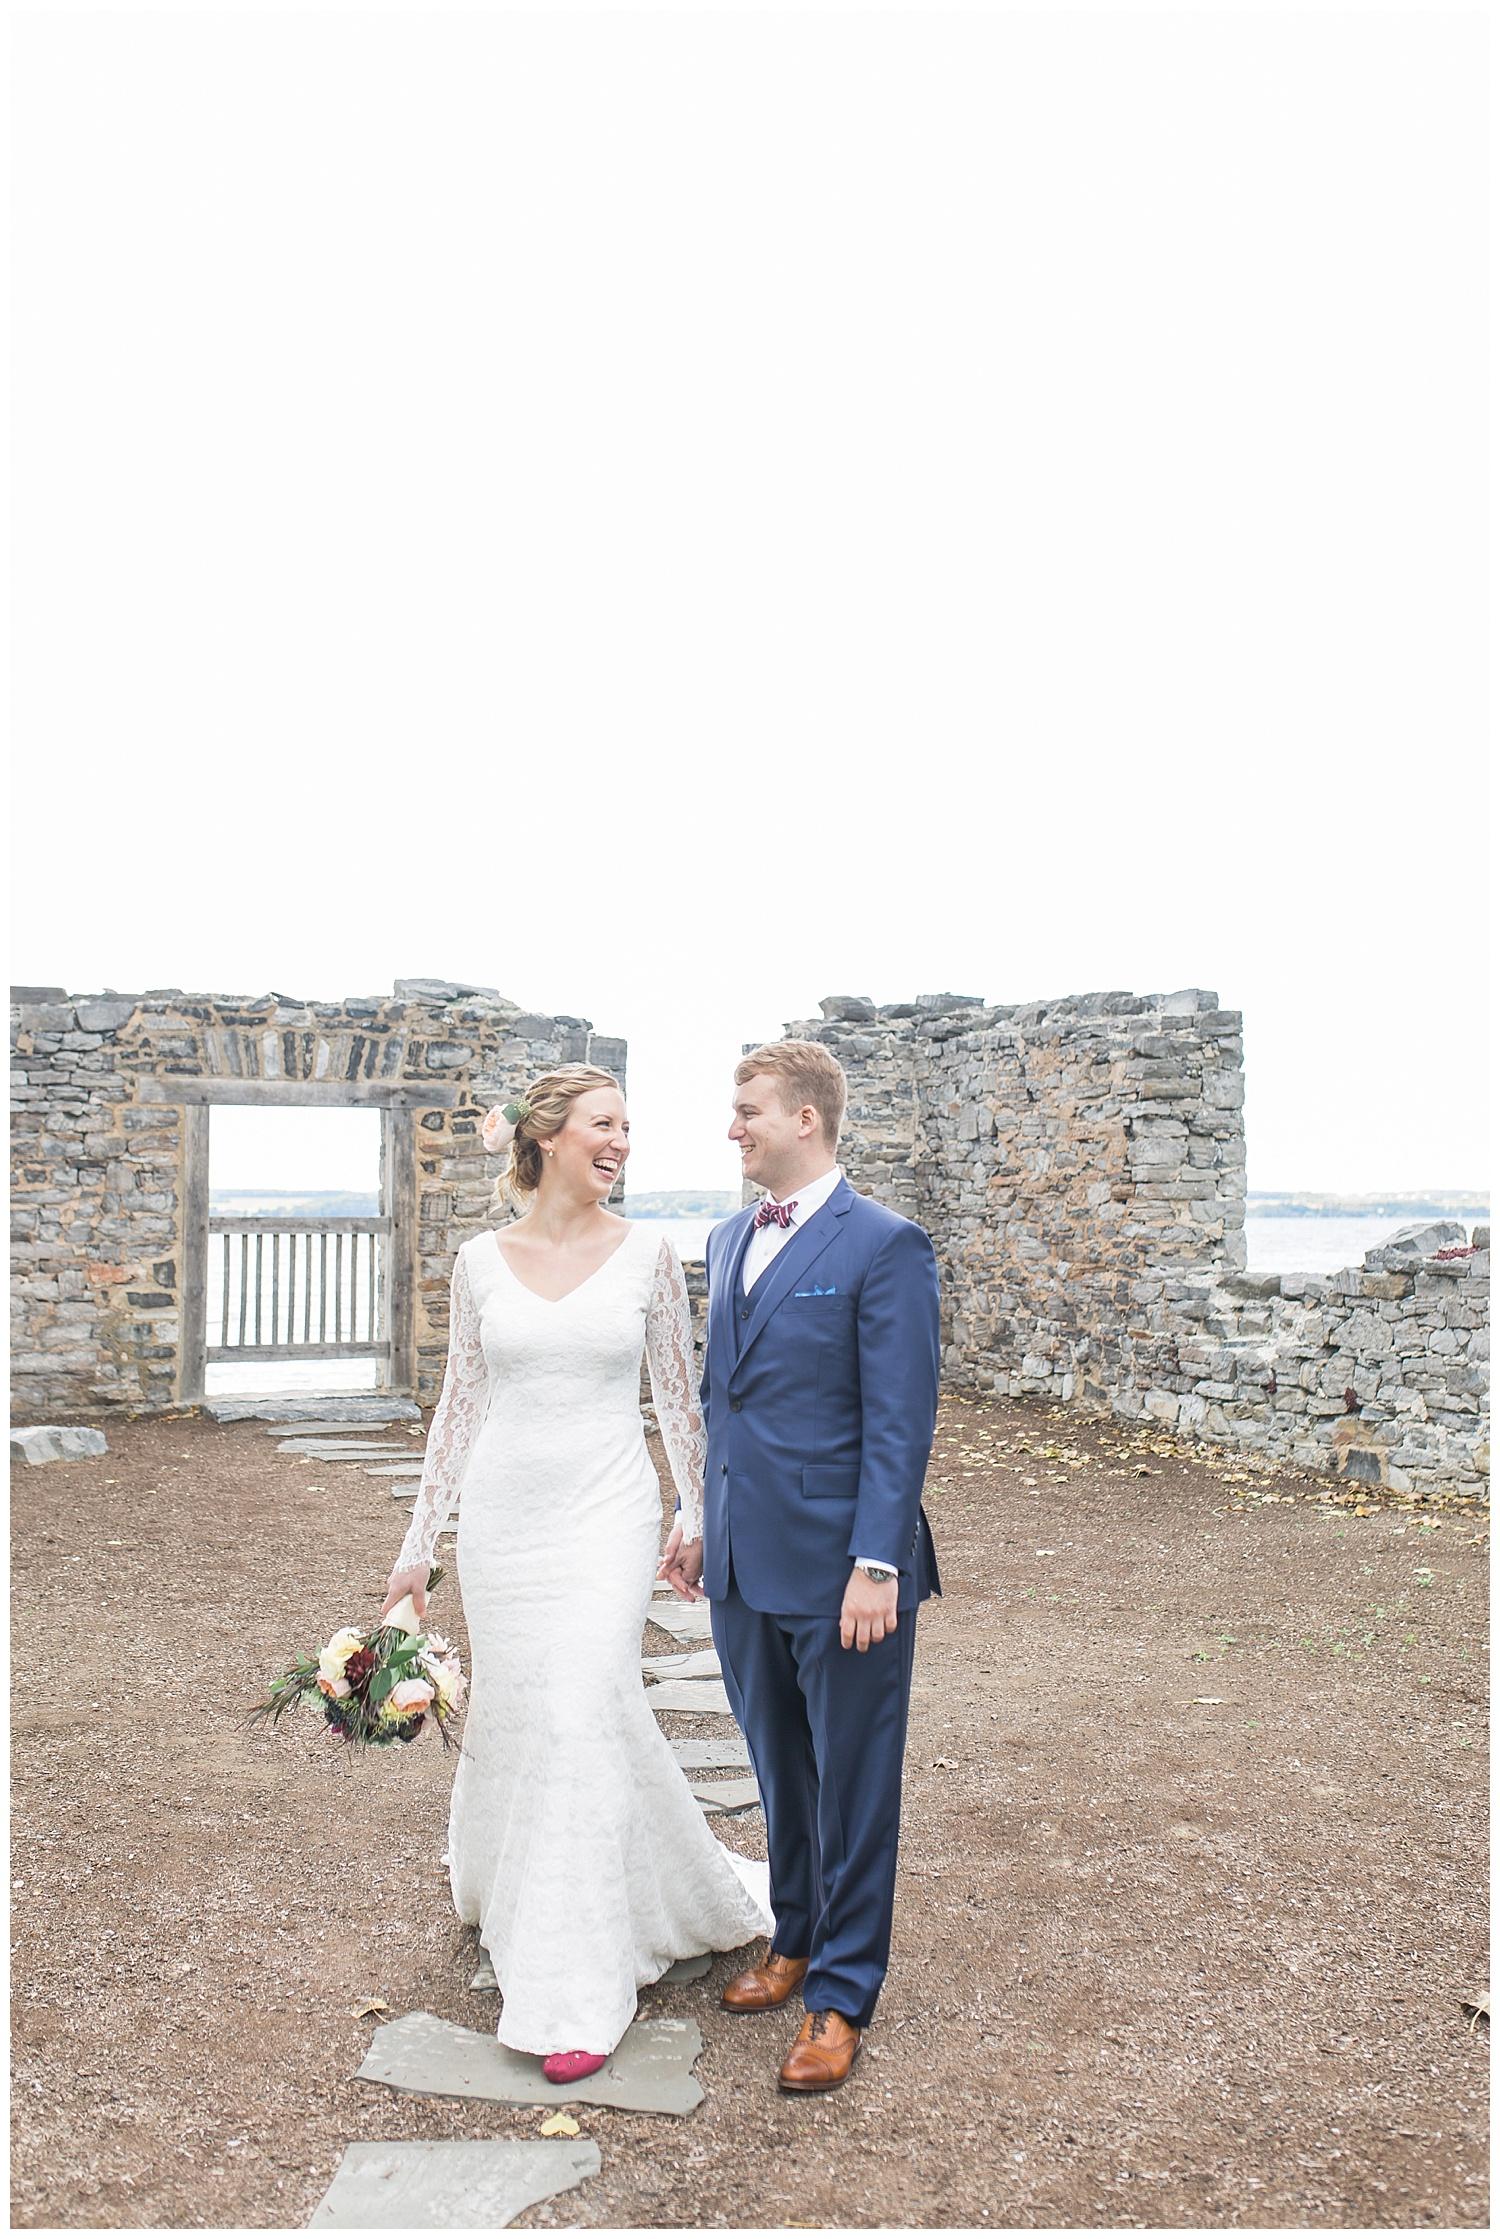 Margaret and Colin - Inns of Aurora - Lass and Beau-862_Buffalo wedding photography.jpg